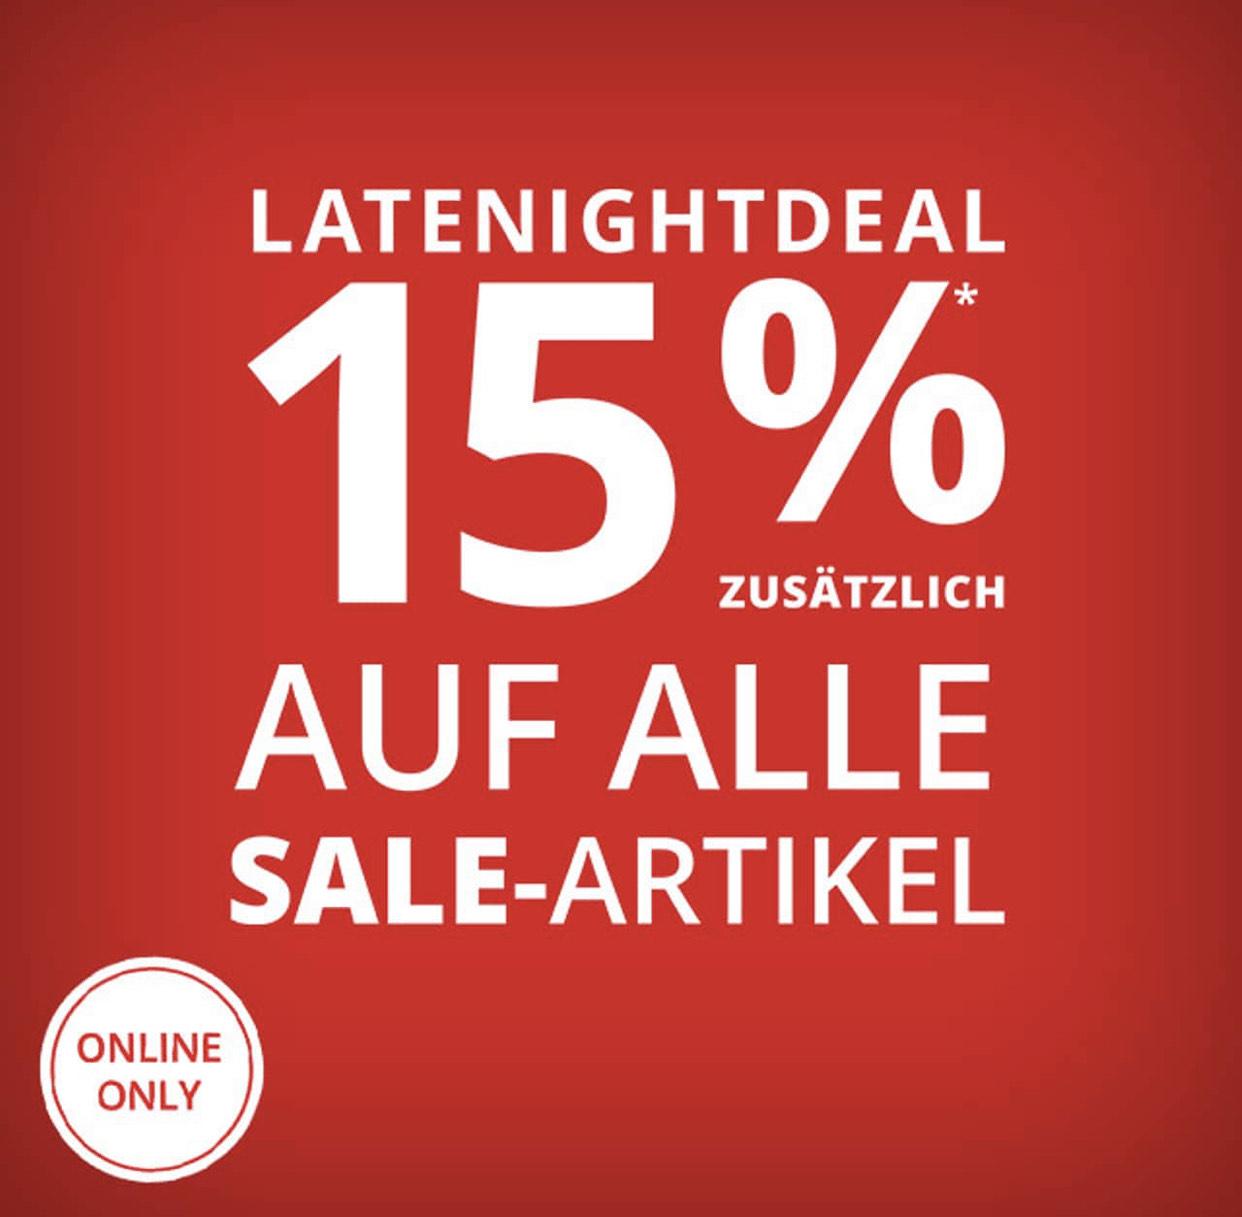 Peek & Cloppenburg: 15% Extra-Rabatt auf Sale-Artikel